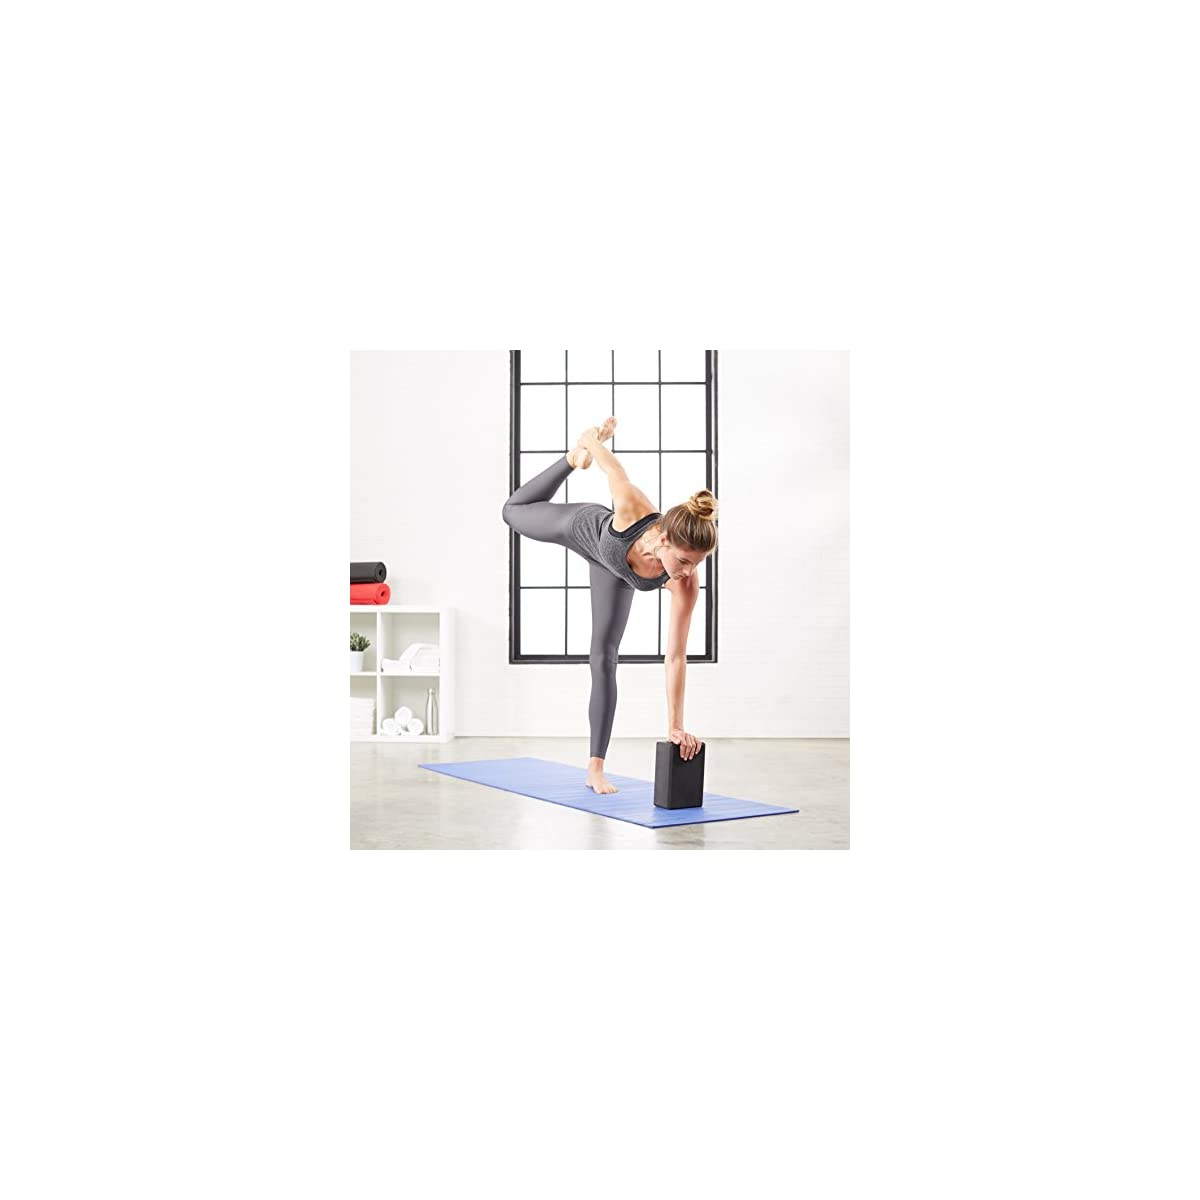 Supportive Foot Exercise Balance, Yoga Foam Wedge Blocks Pair Soft Wrist Wedge